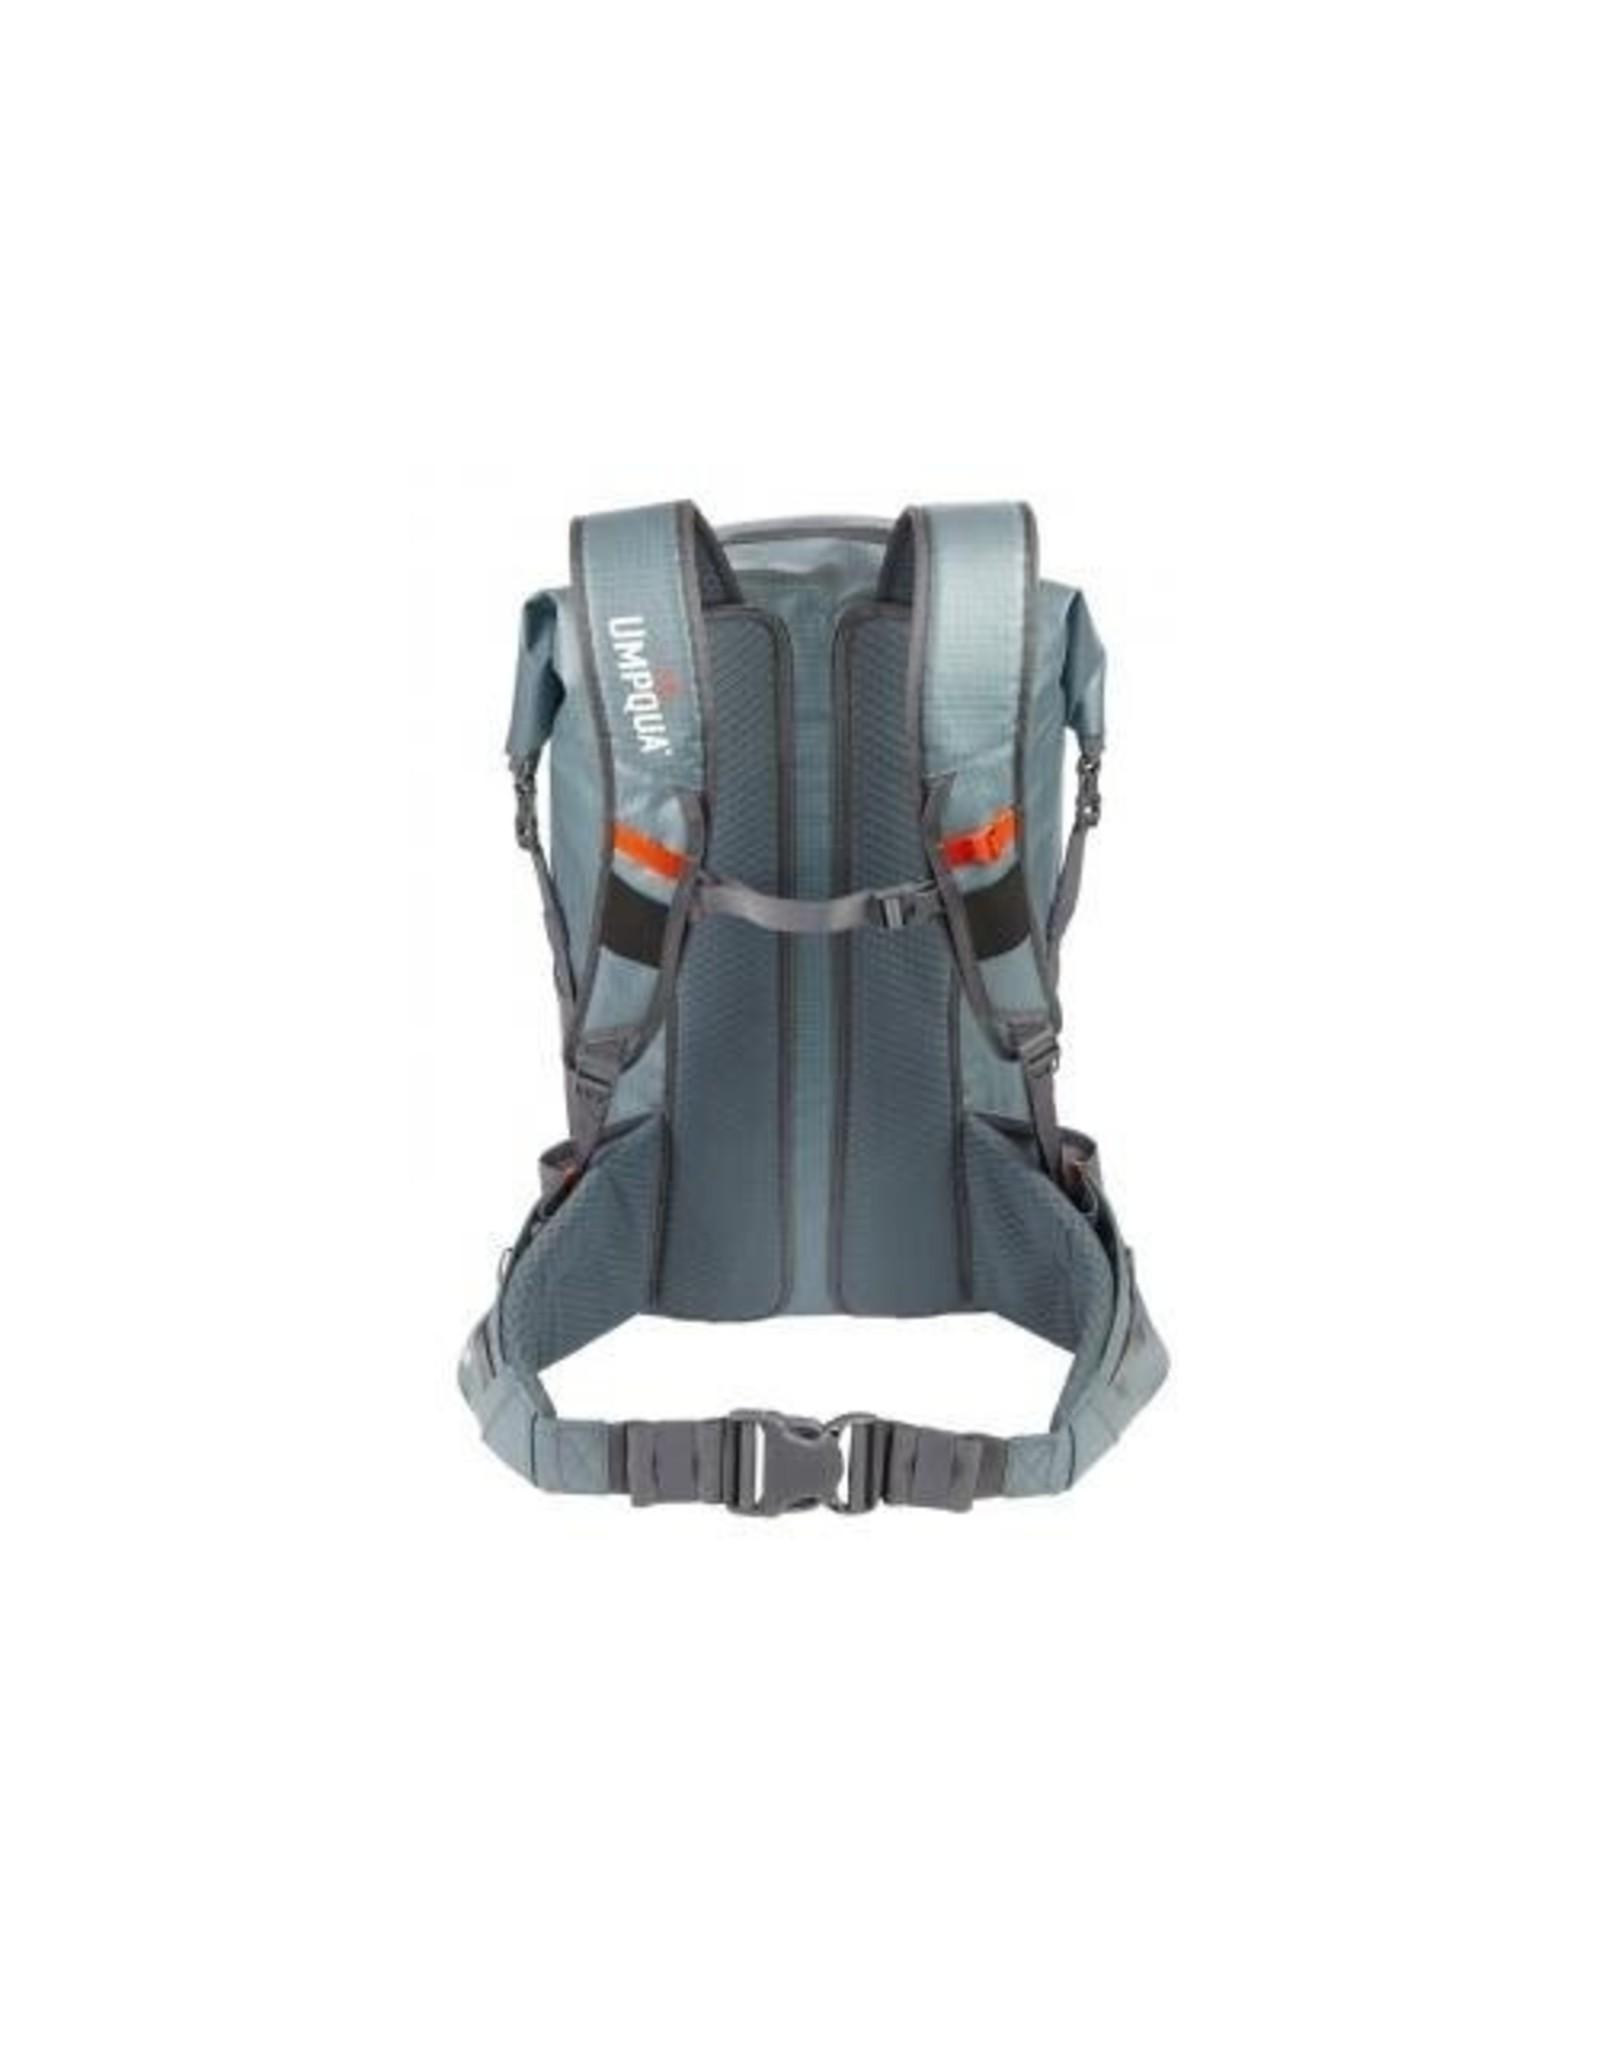 Umpqua Tongass 1800 Waterproof Backpack